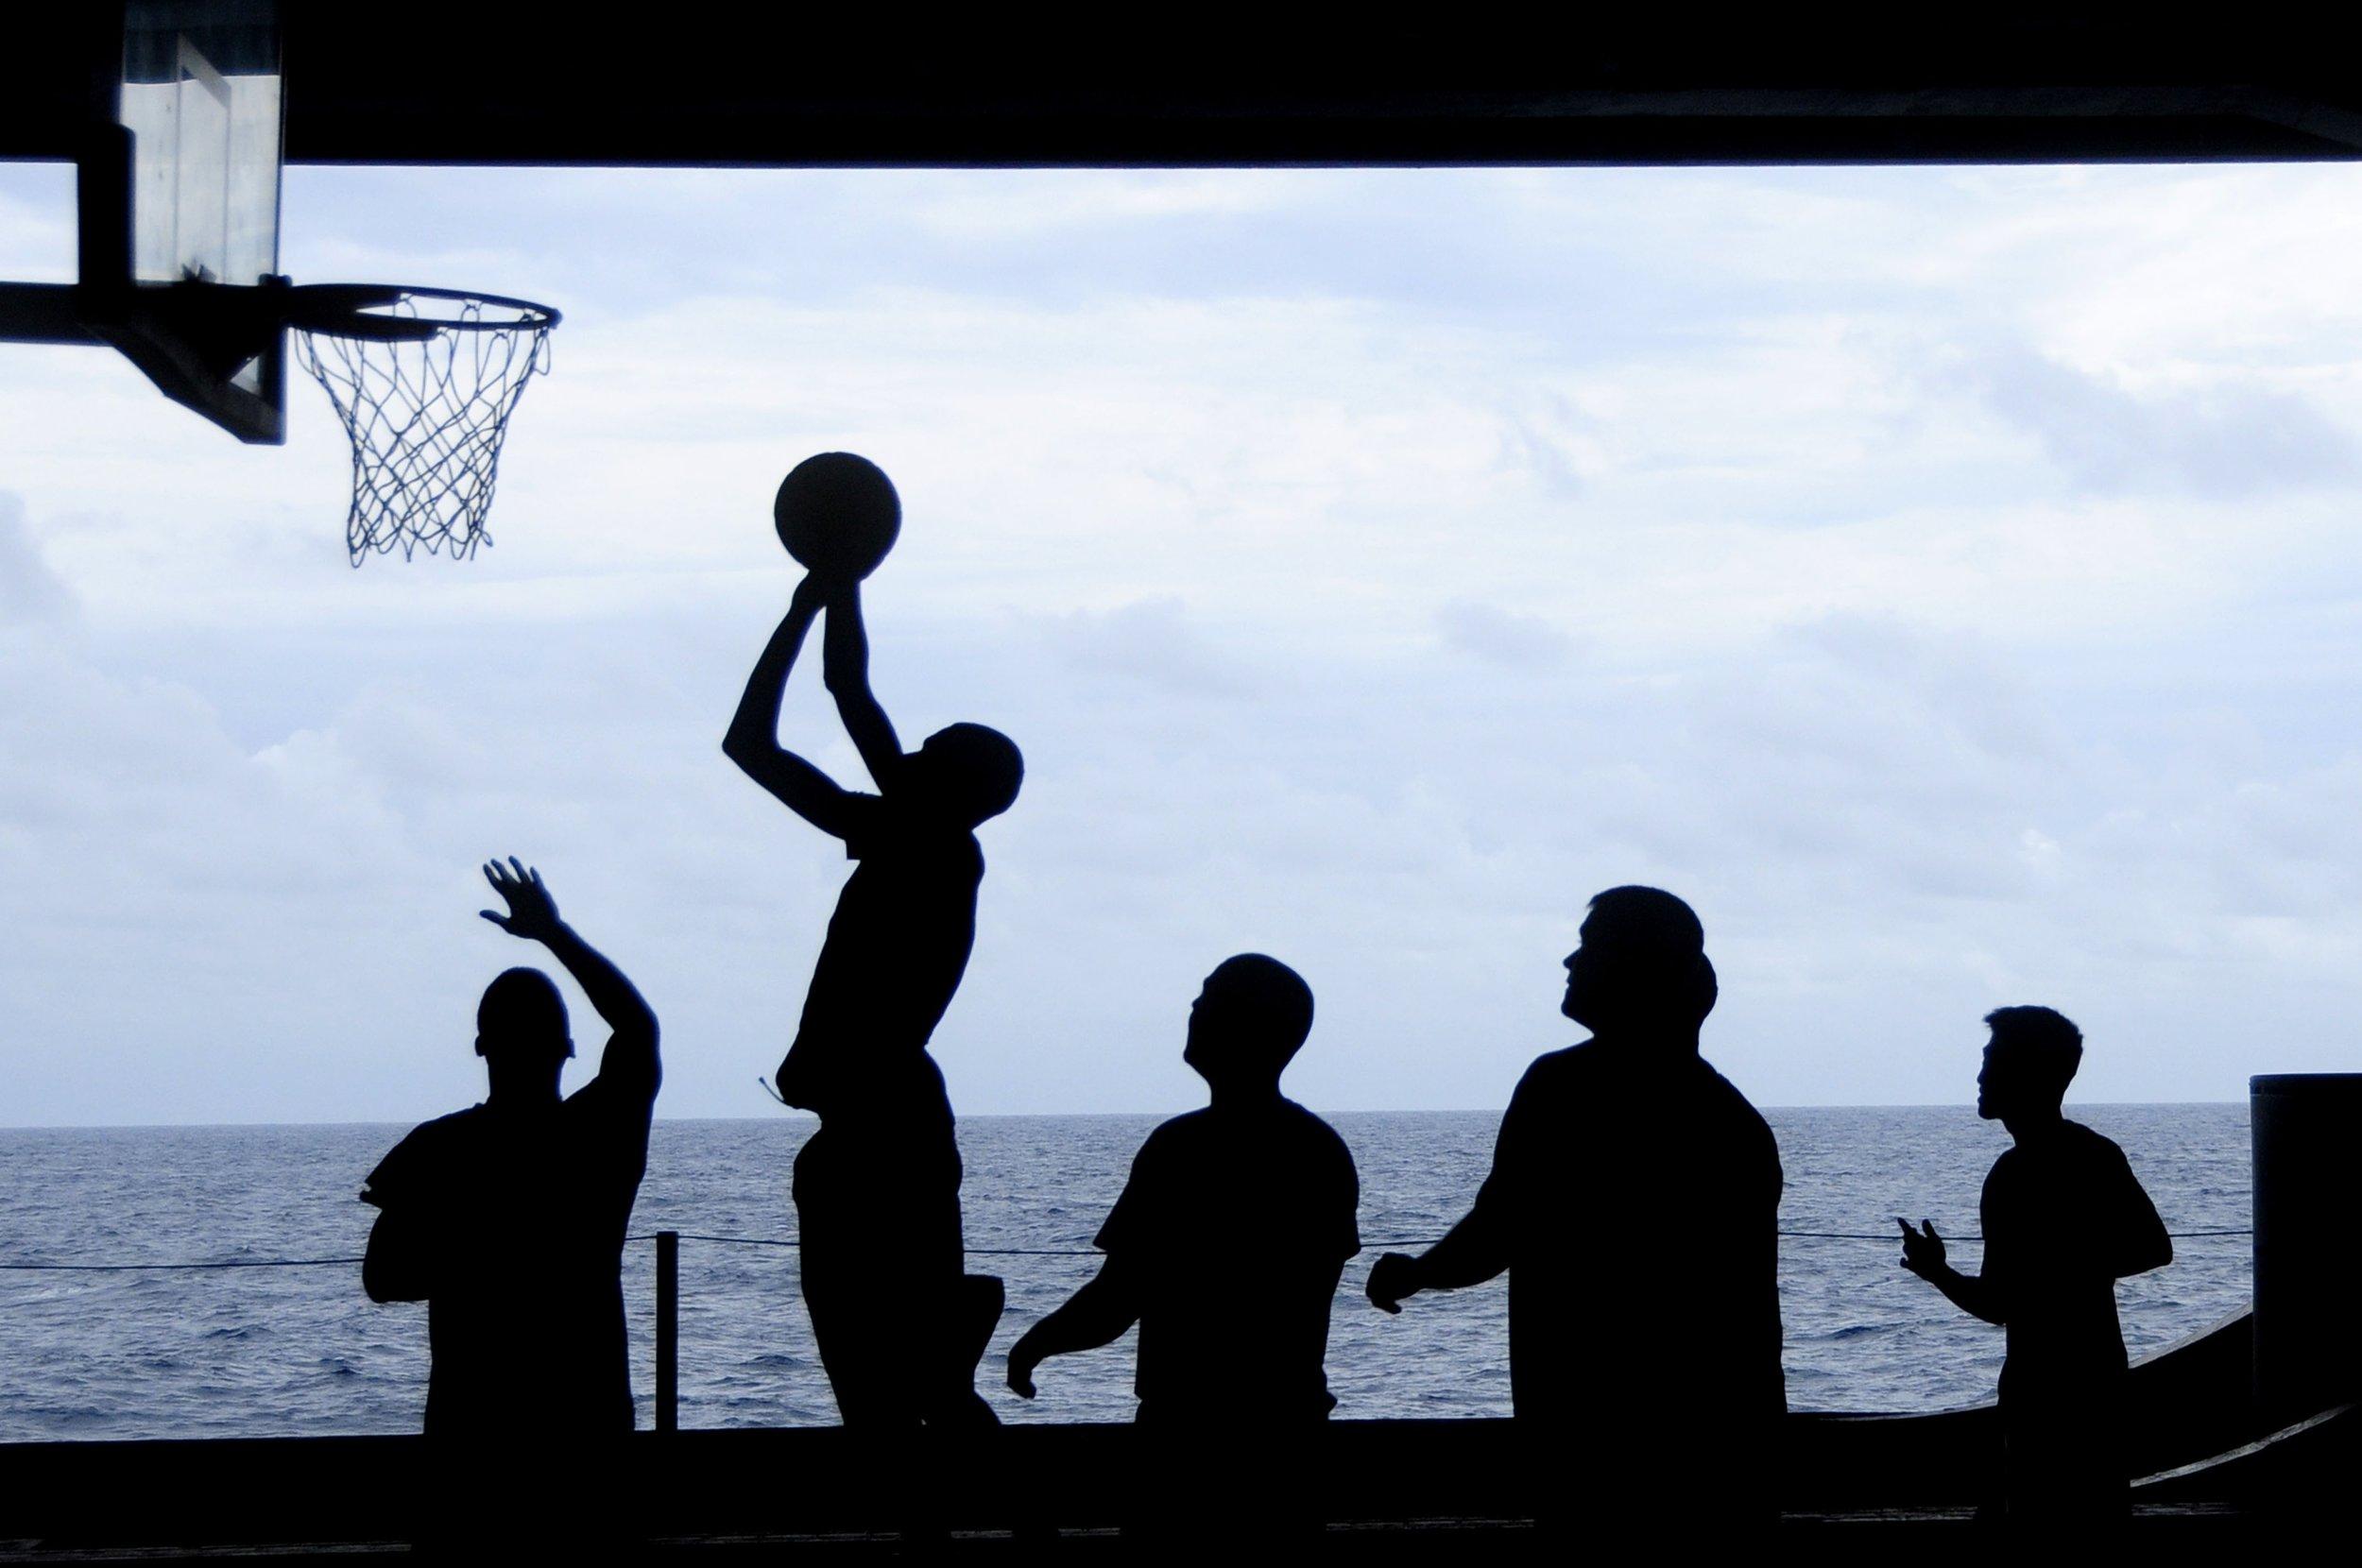 uss-nimitz-basketball-silhouettes-sea-69773.jpeg